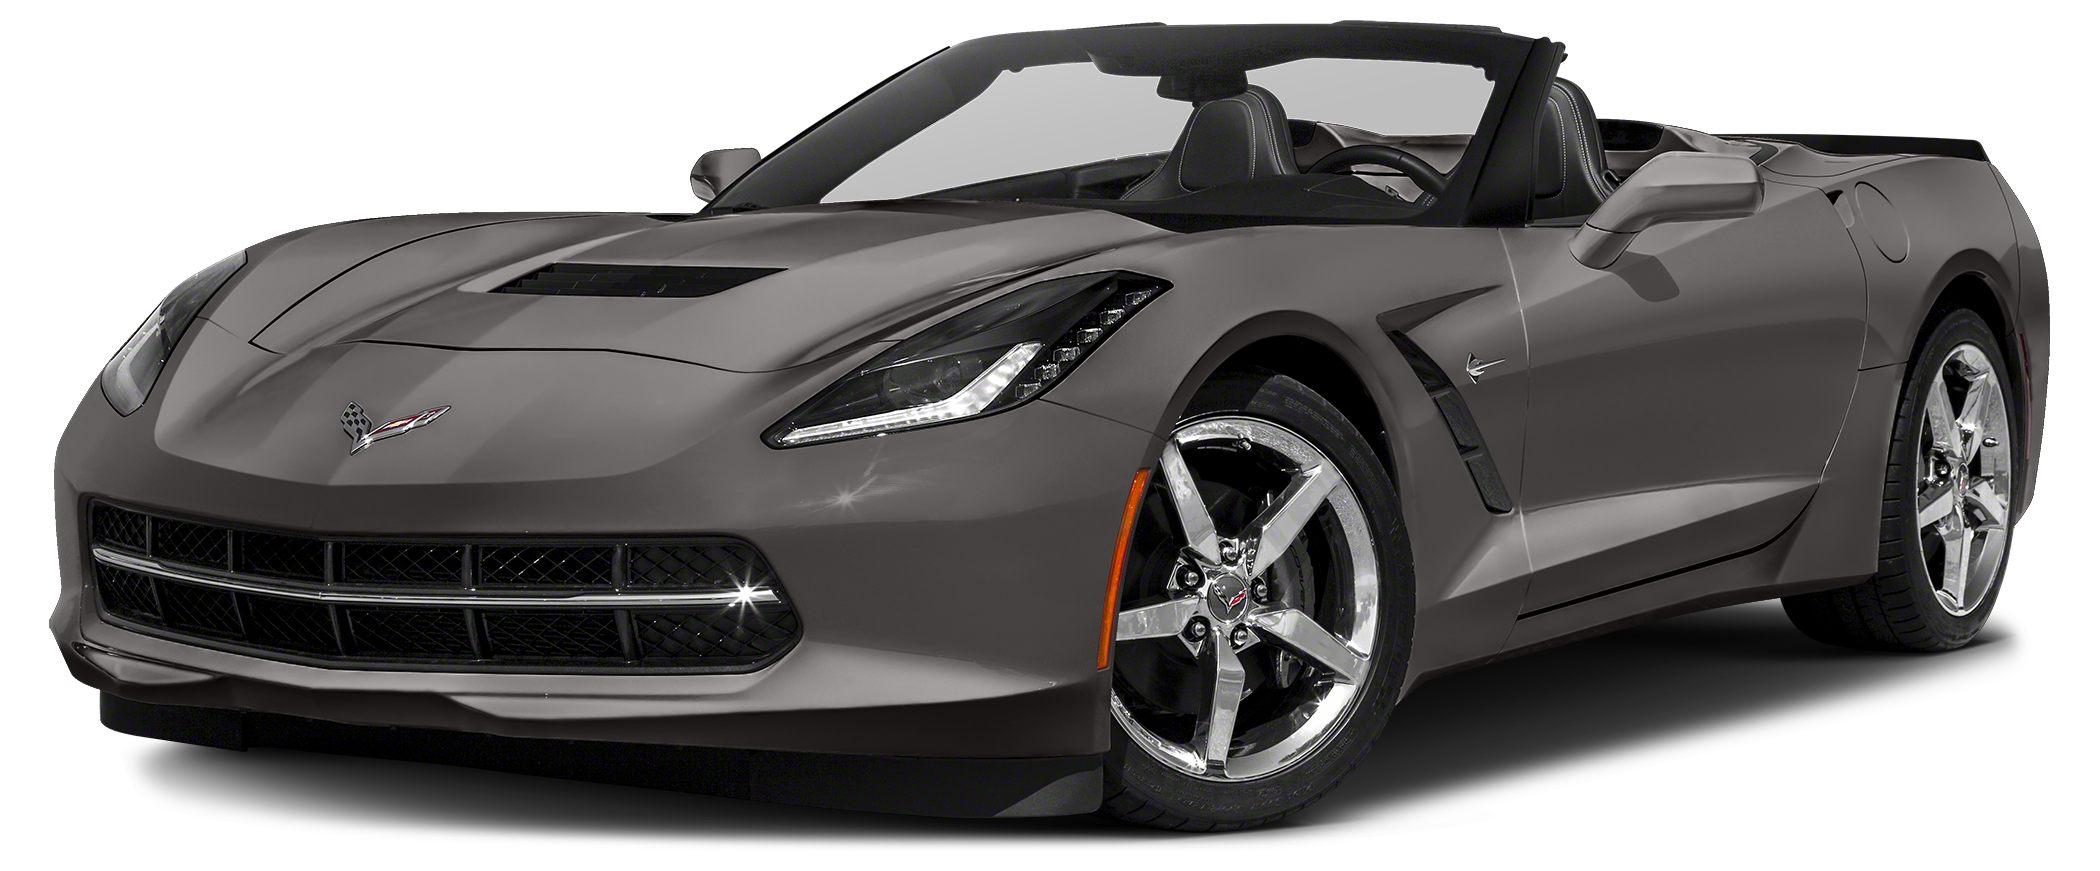 2015 Chevrolet Corvette Stingray Miles 25435Color Dark Gray Metallic Stock B4331 VIN 1G1YA3D